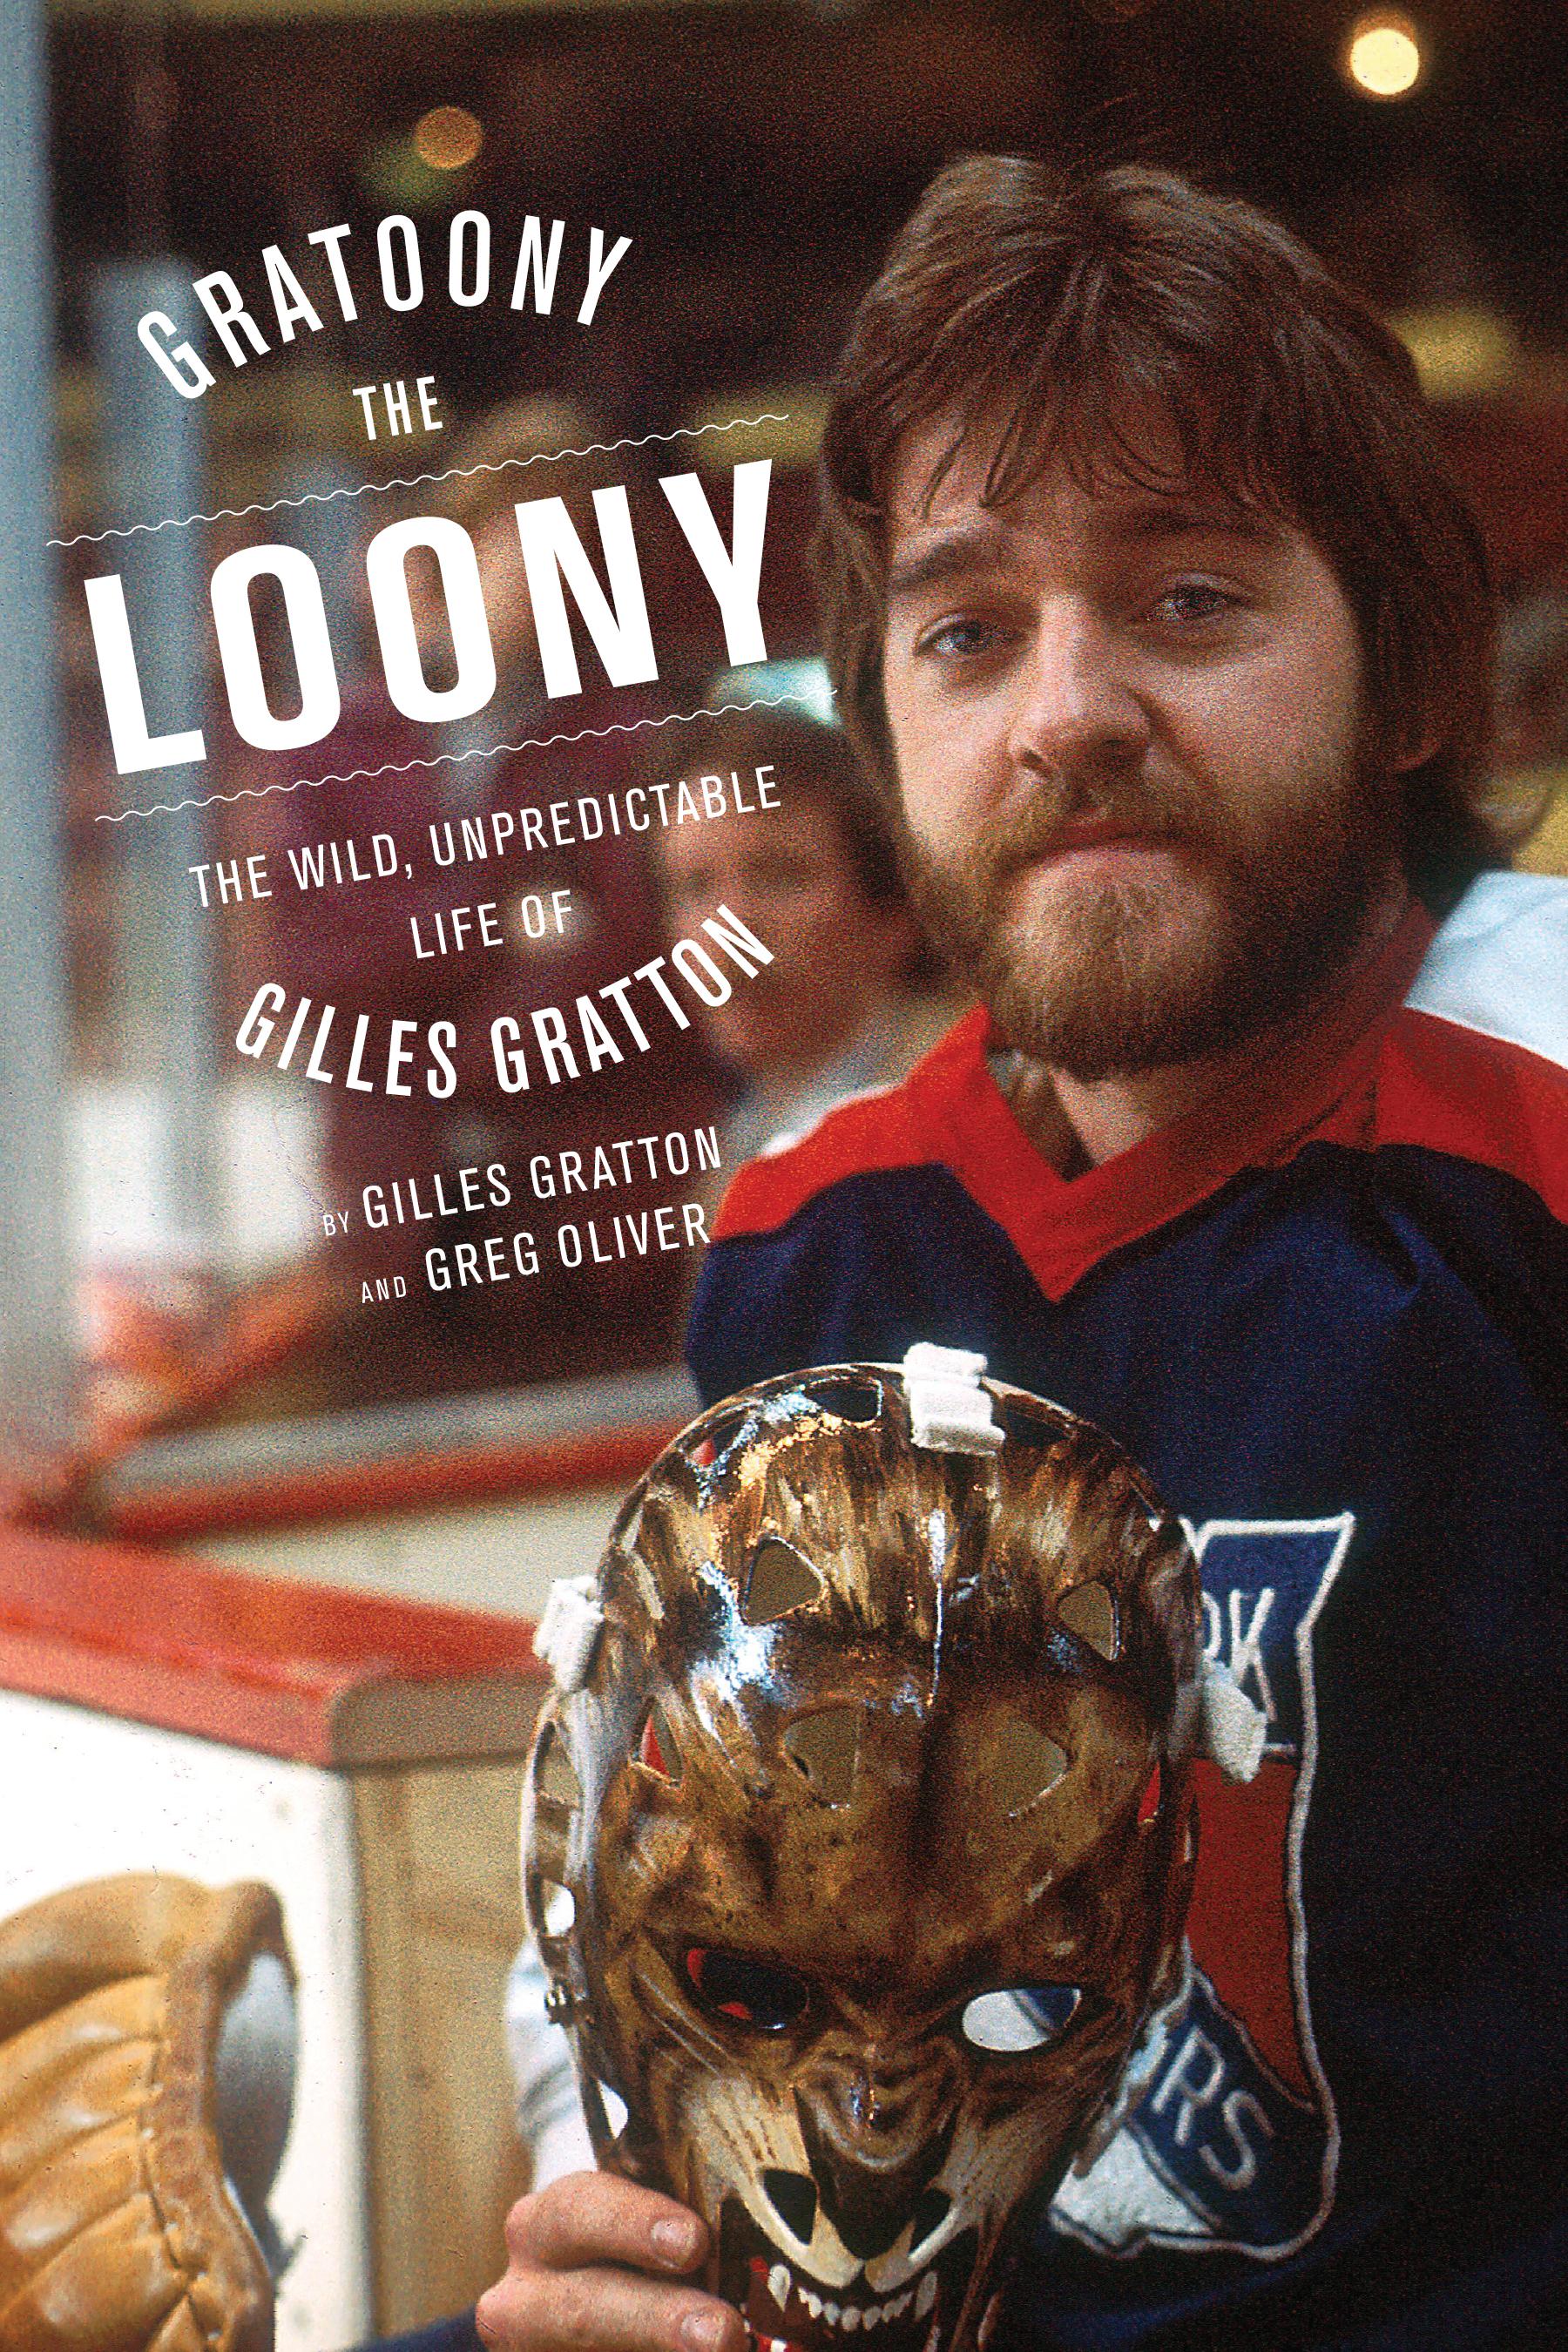 Gratoony the Loony